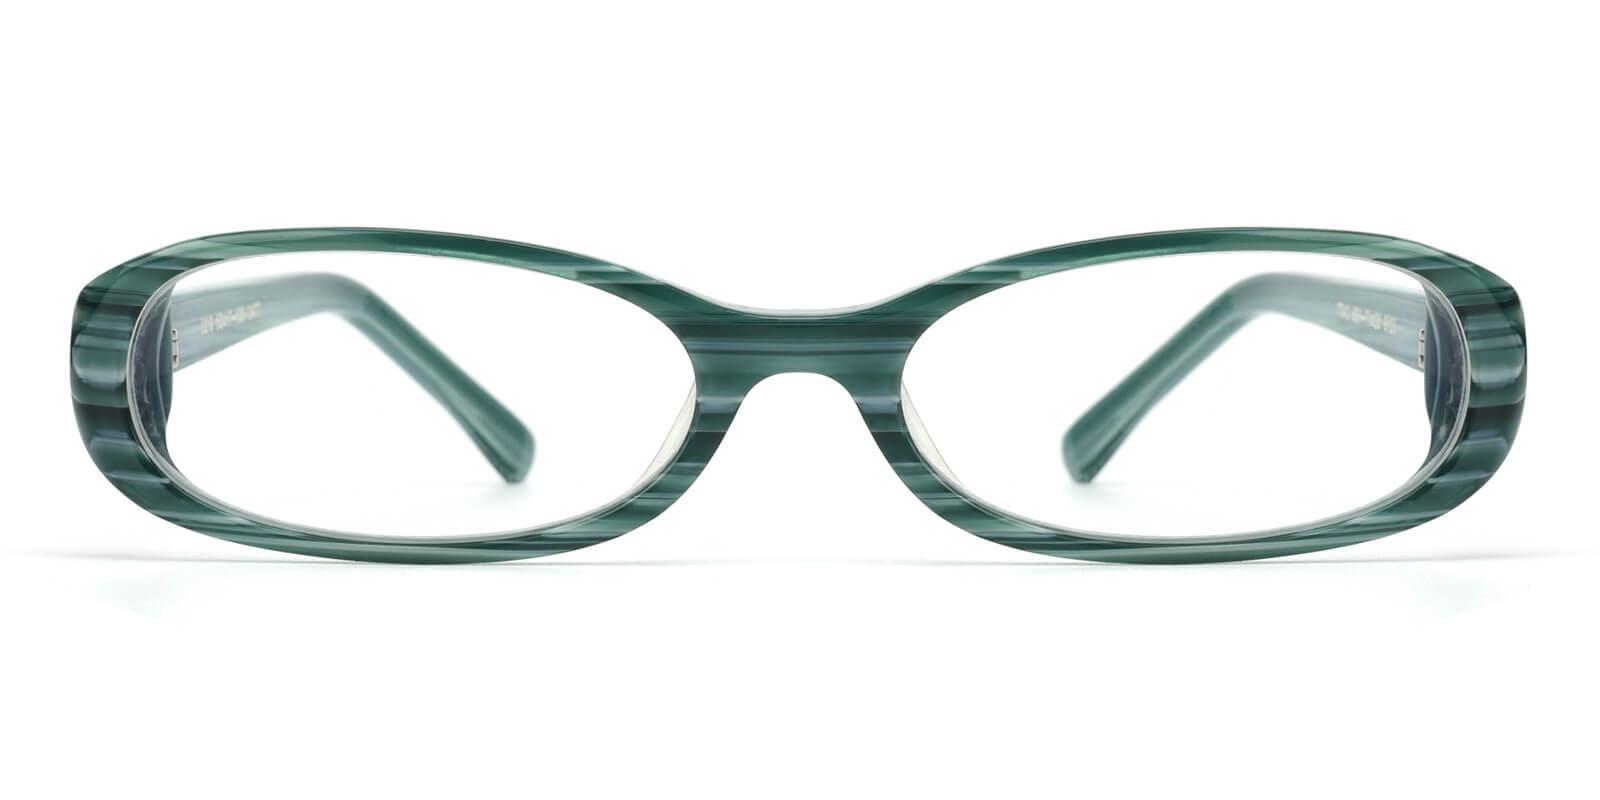 Opla-Green-Rectangle-Acetate-Eyeglasses-additional2